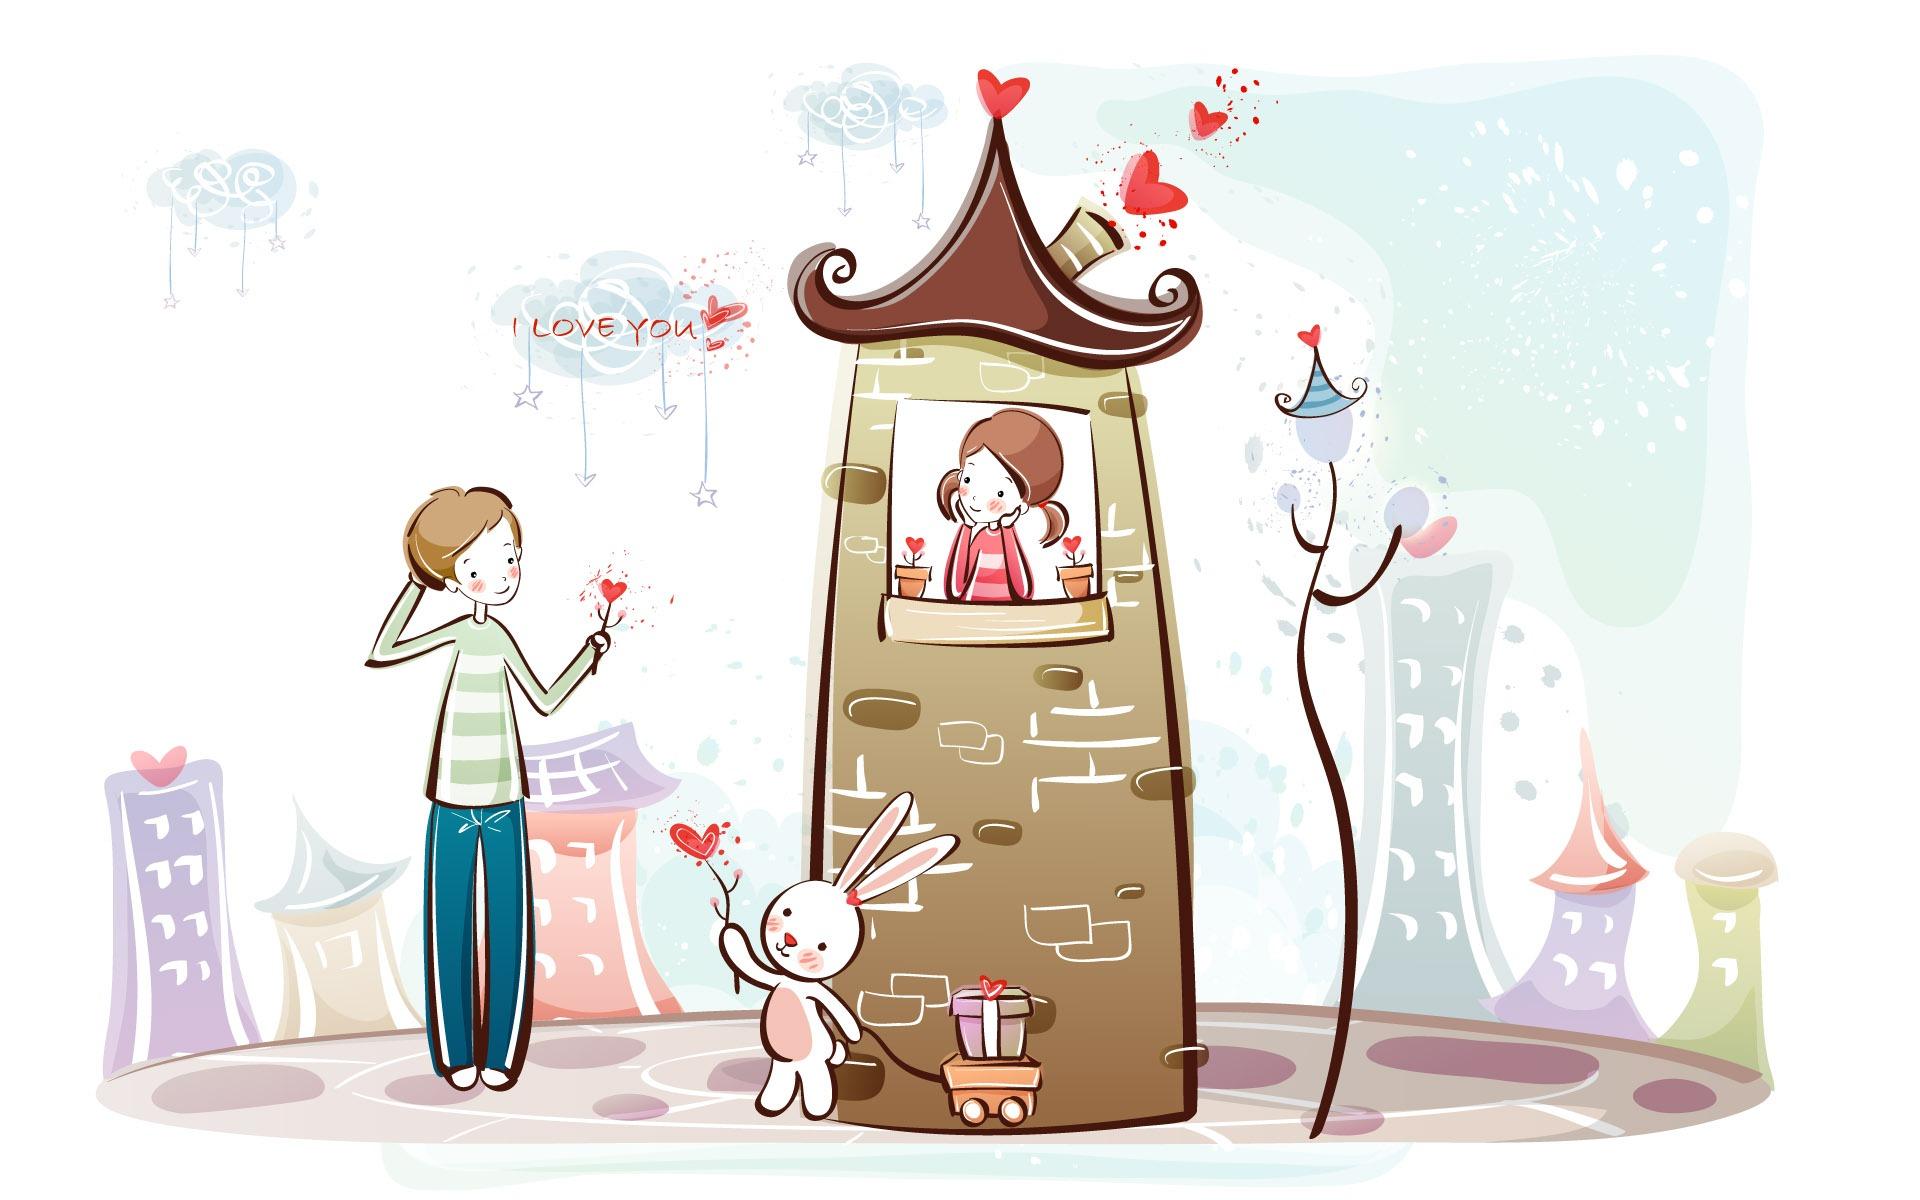 Fondos de pantalla de dibujos animados de San Valentín (1) # 8.